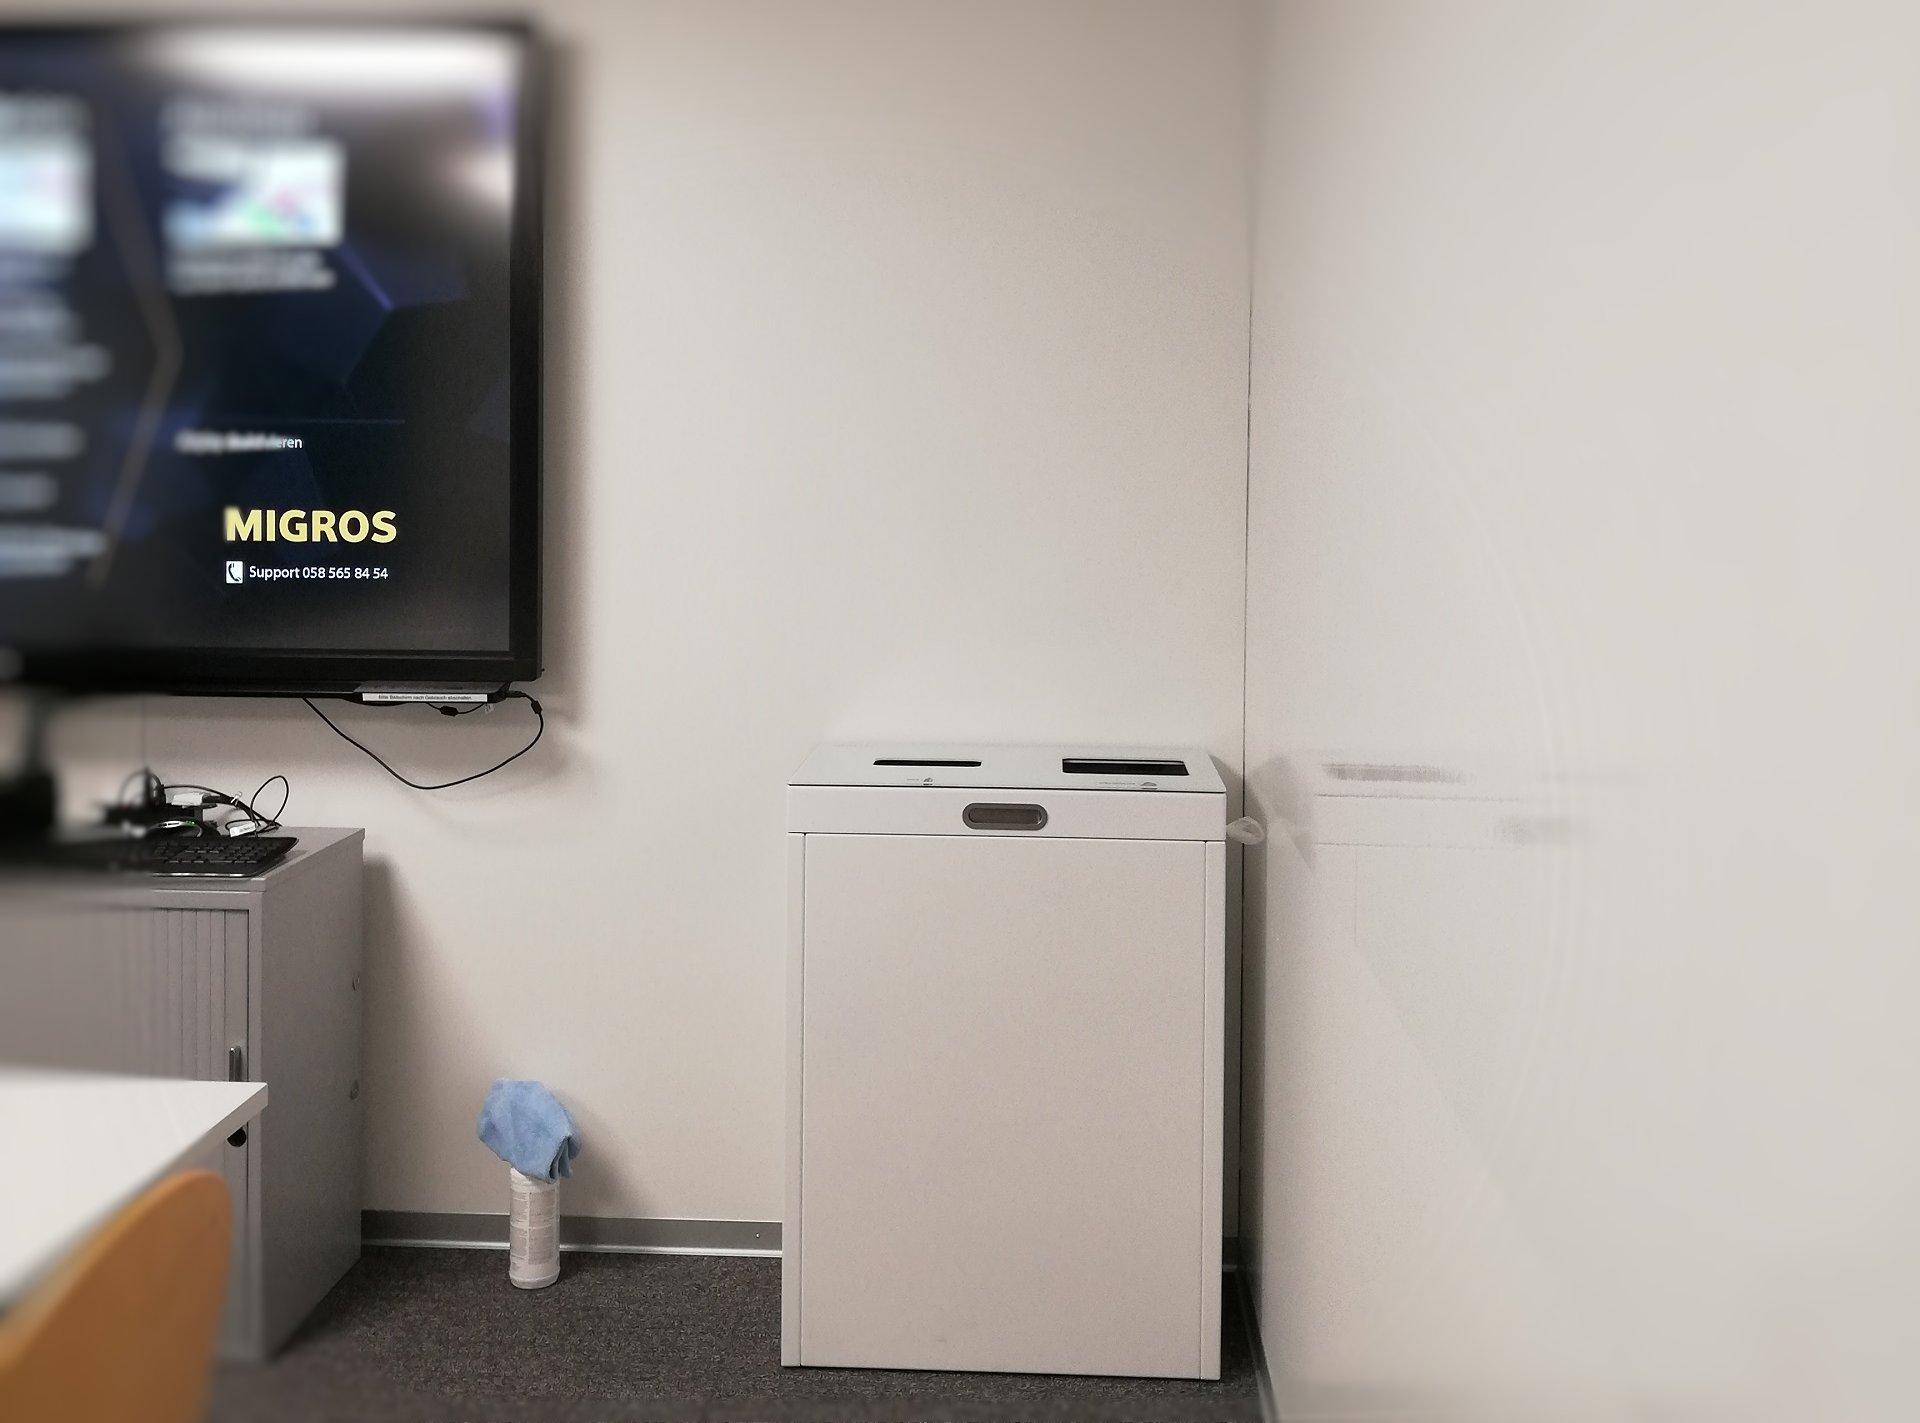 Recycling Station Multilith 2.0, Public Waste bins, Wertstofftrenner Migros Aare, Abfall PET, Papier, 110l, Innen. Büro, Office, Abfallbehälter, Abfalltrenner